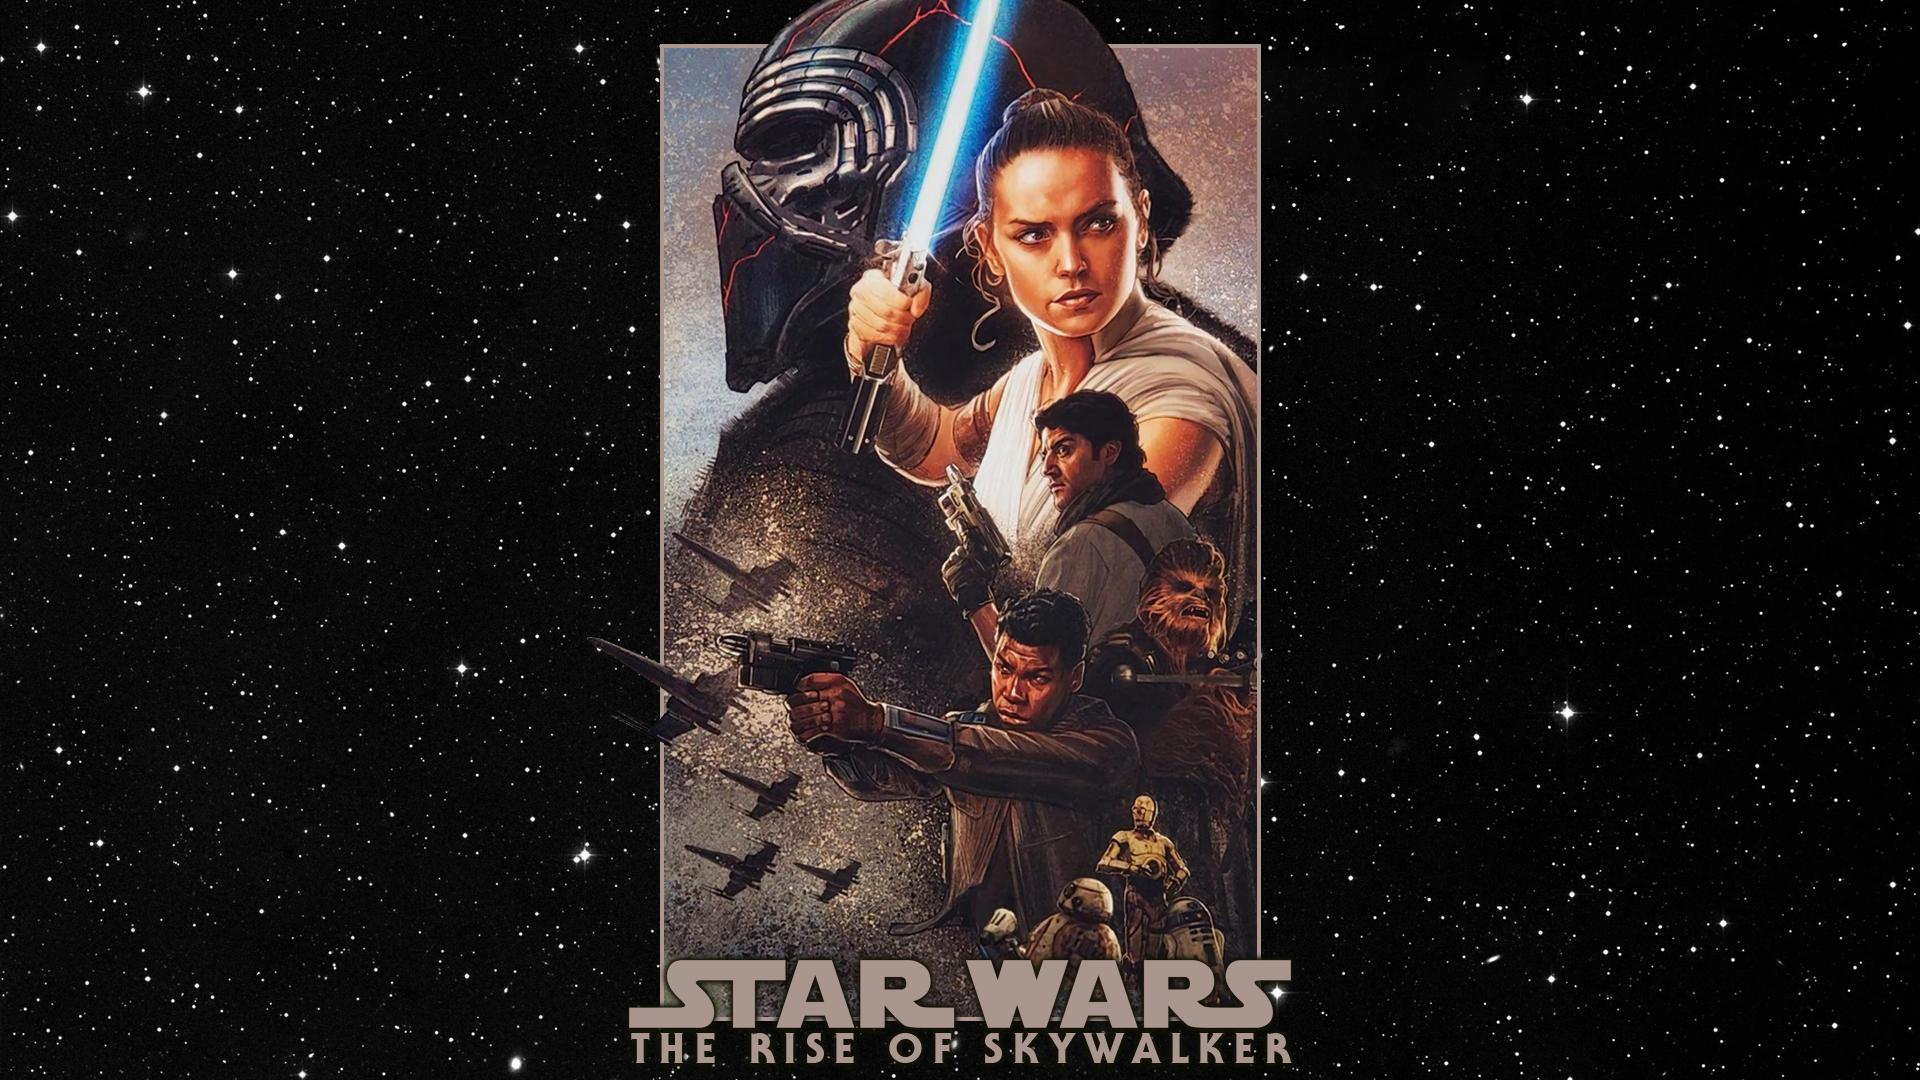 The Rise Of Skywalker Mural Wallpaper By Spirit Of Adventure On